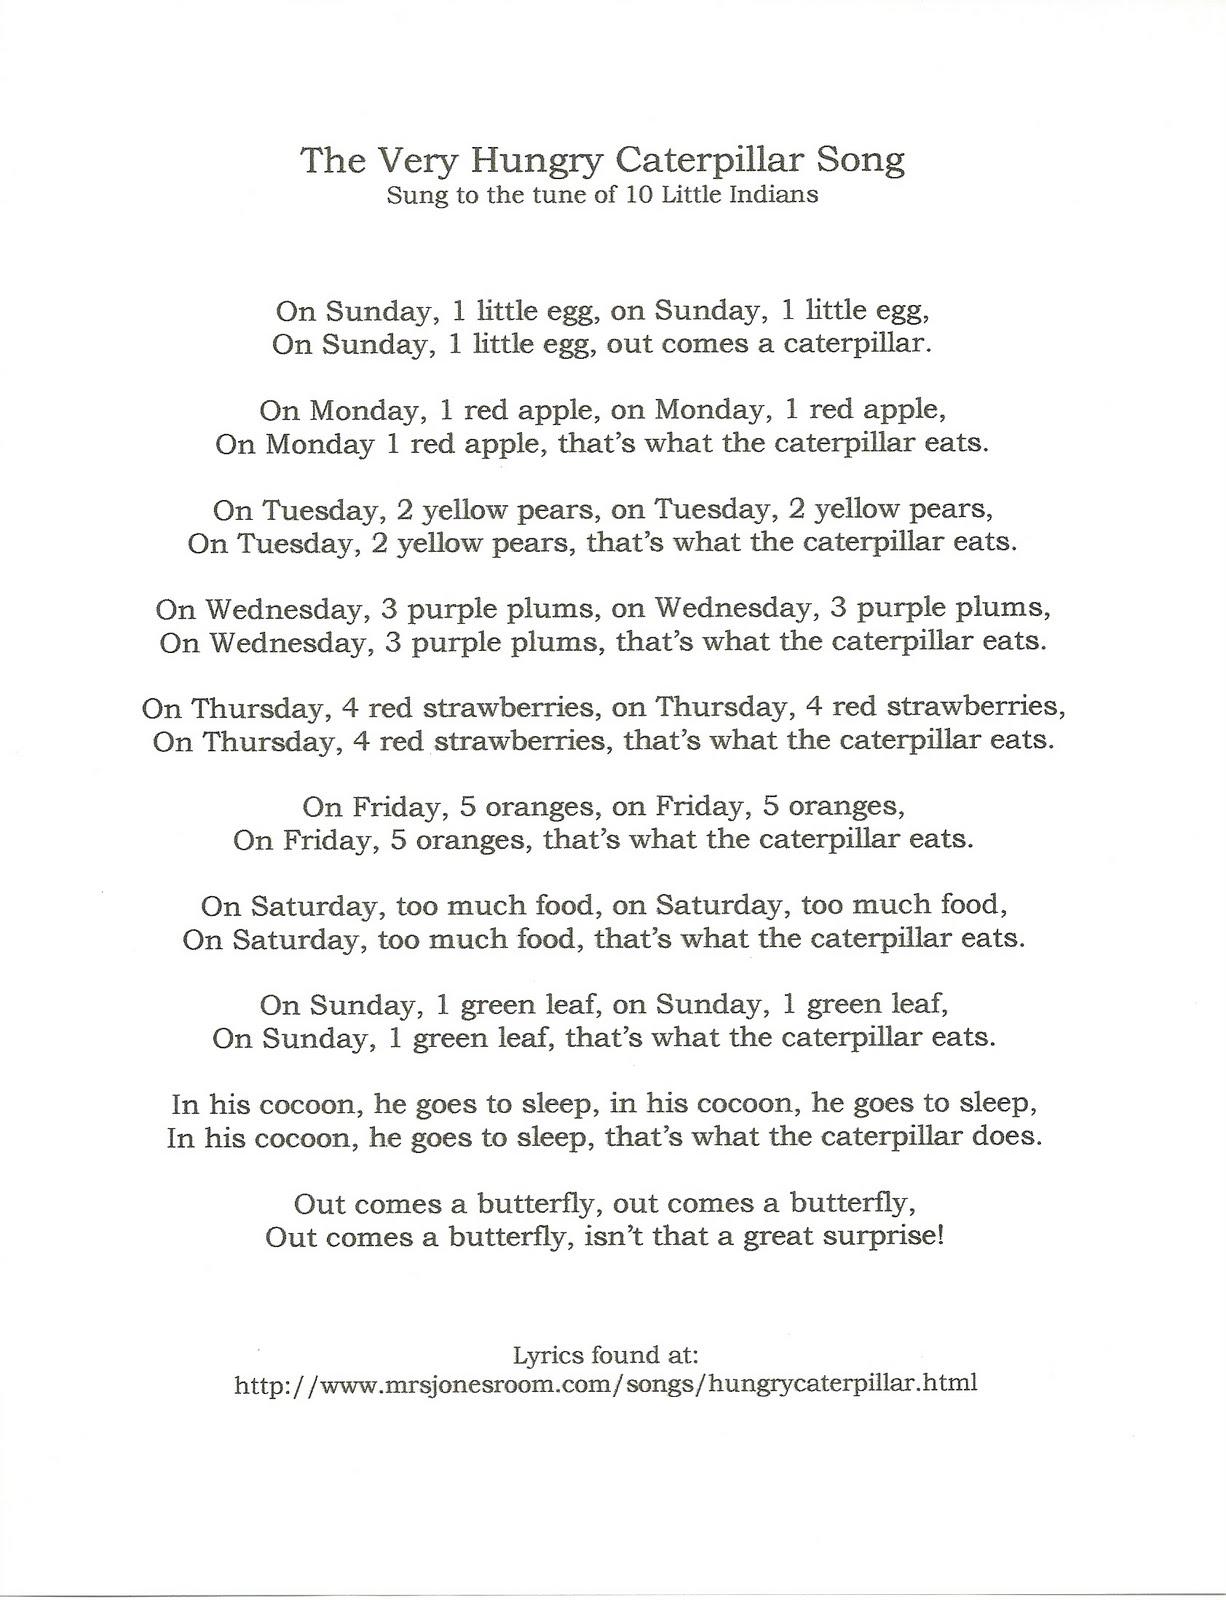 The hungry song lyrics